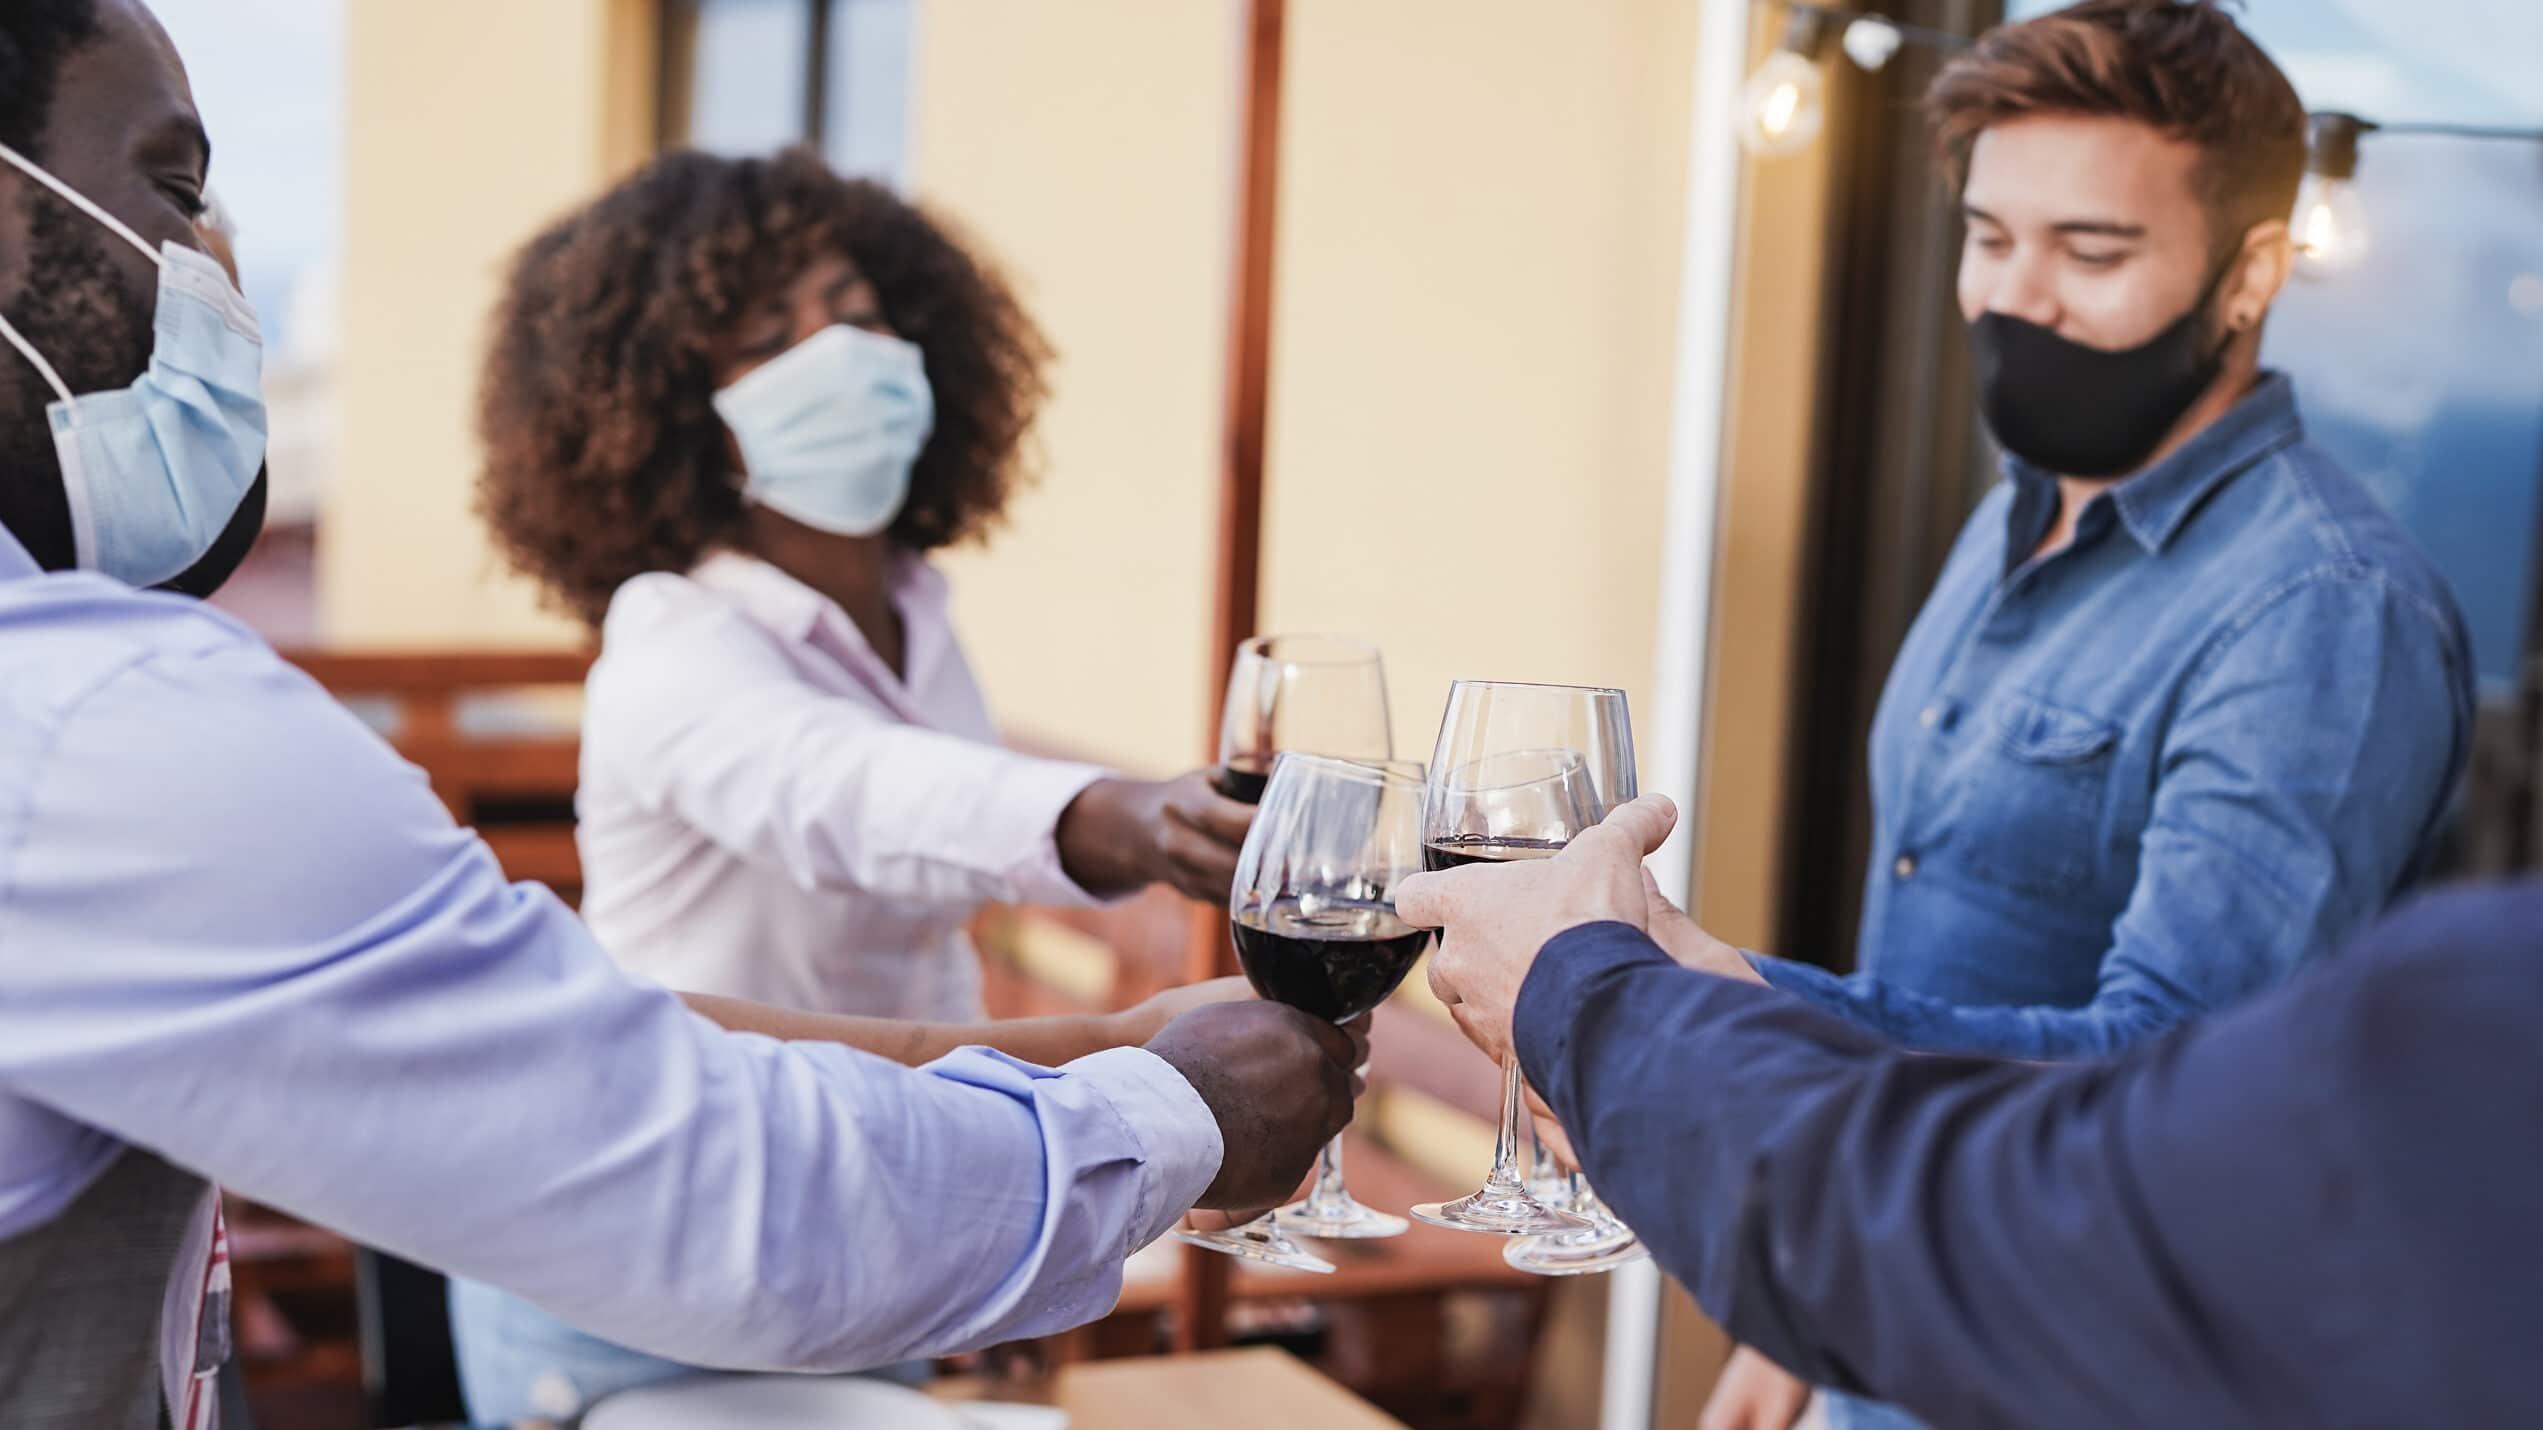 covid regulation at the wine school